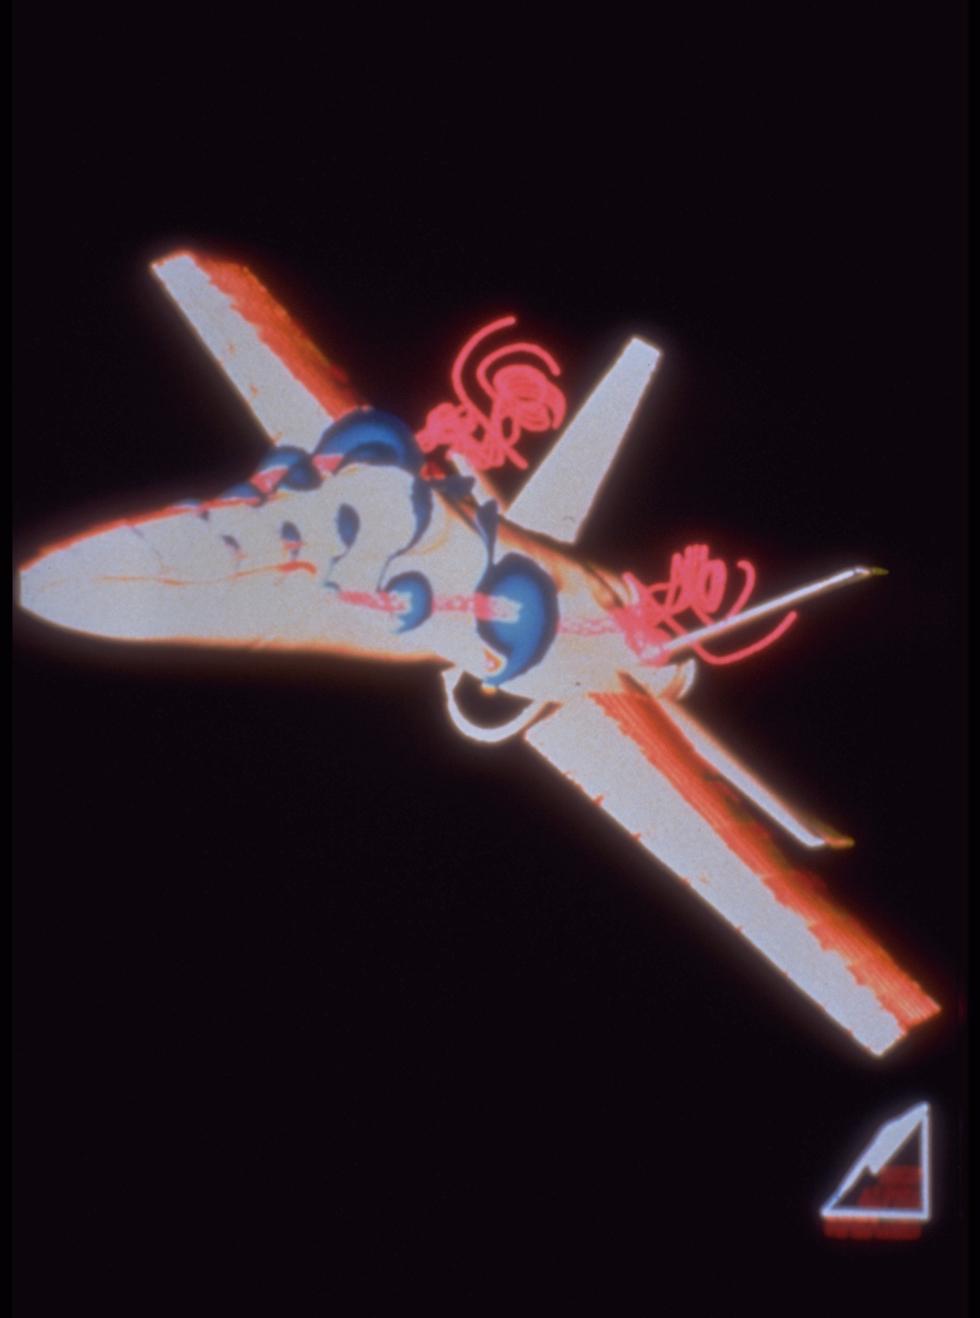 F-18, 1990